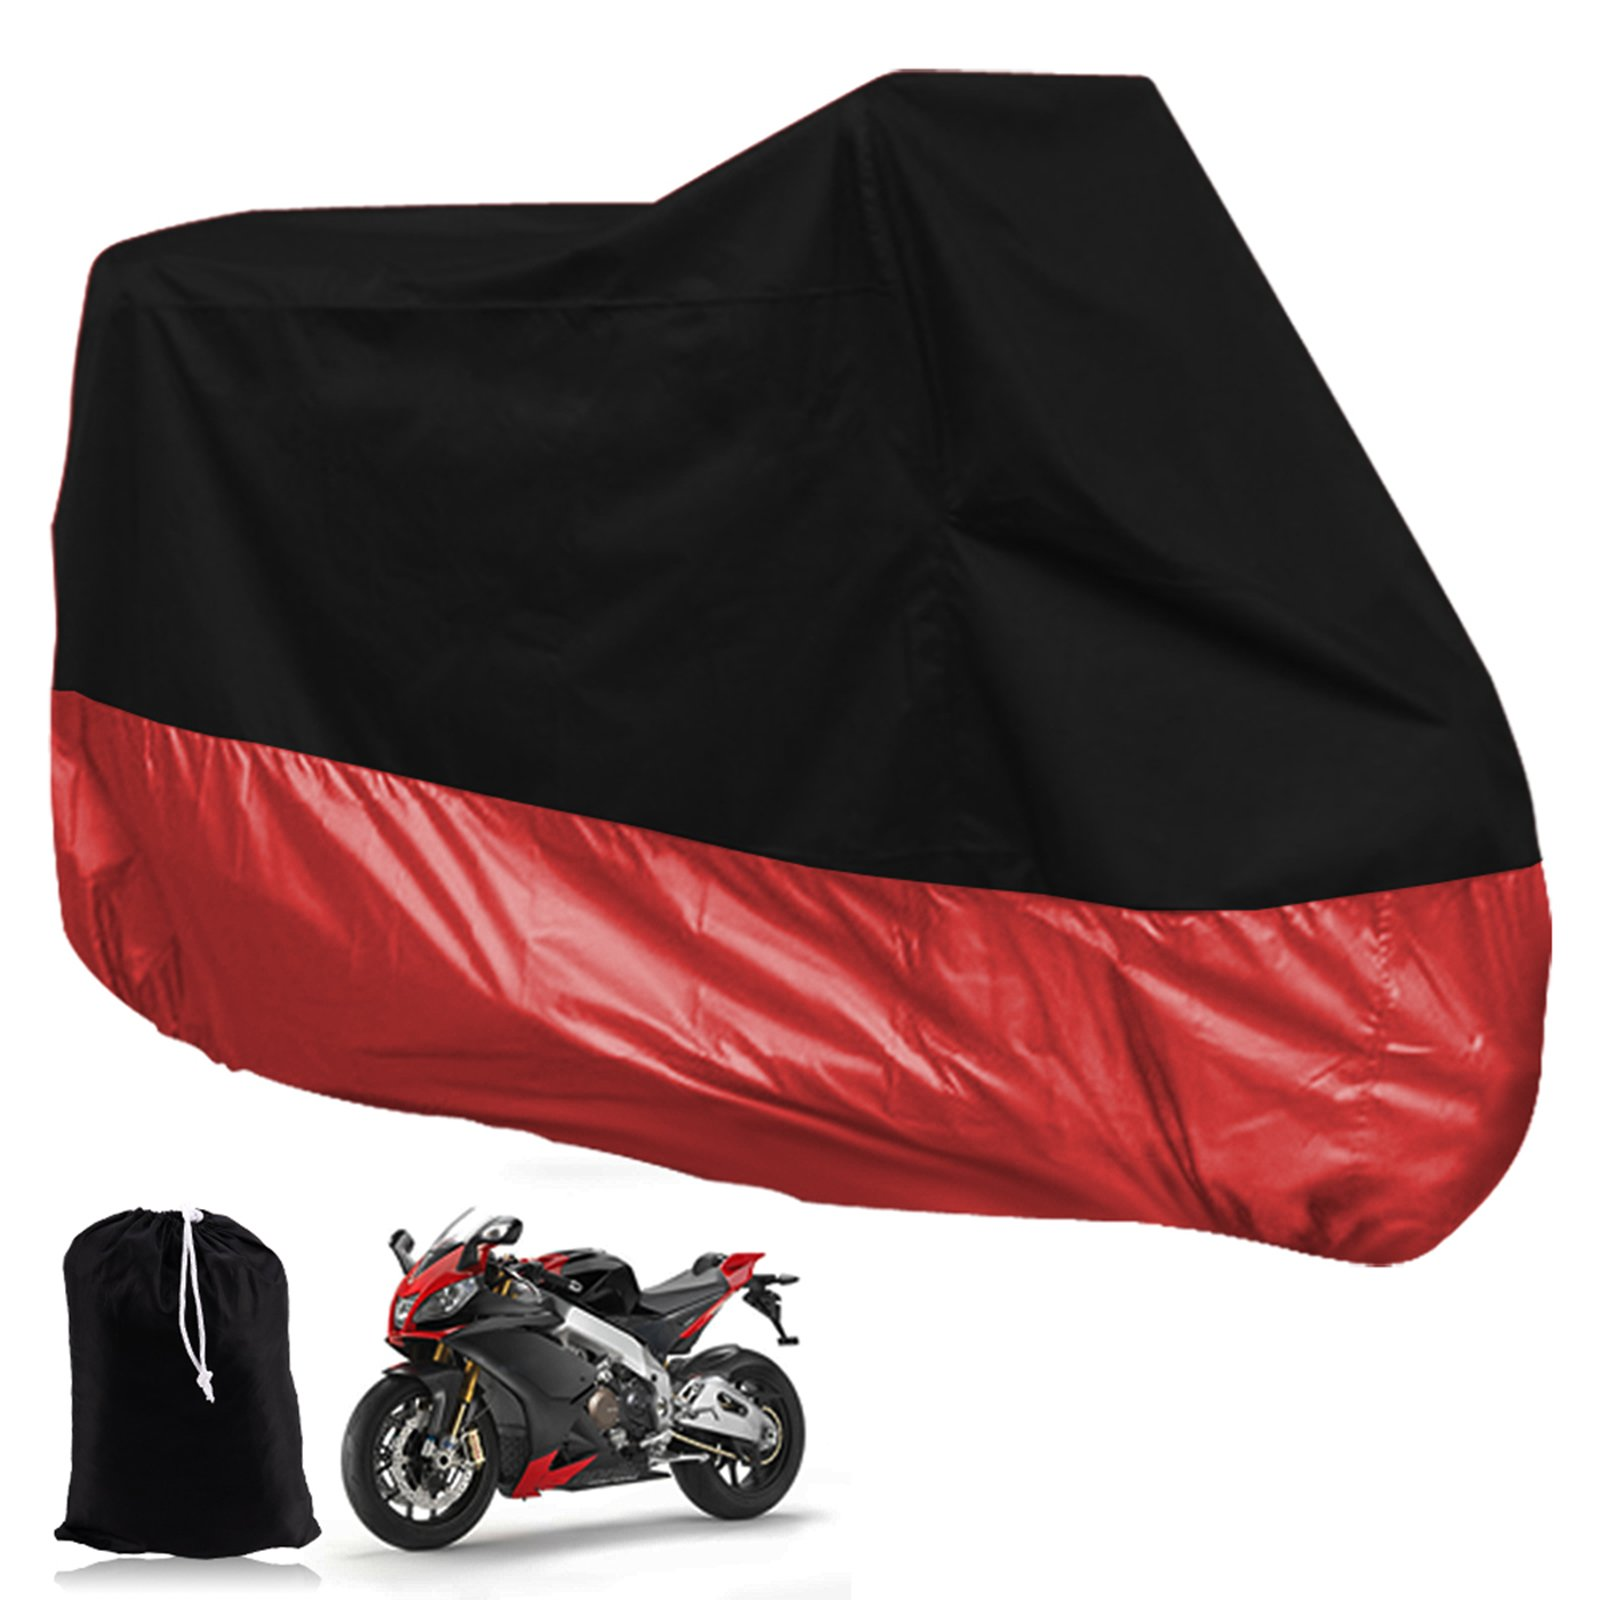 245cm Size XL Motorcycle Cover Waterproof Outdoor Uv Protector Bike Rain Dustproof For Motorbike Scooter Wholesale Price